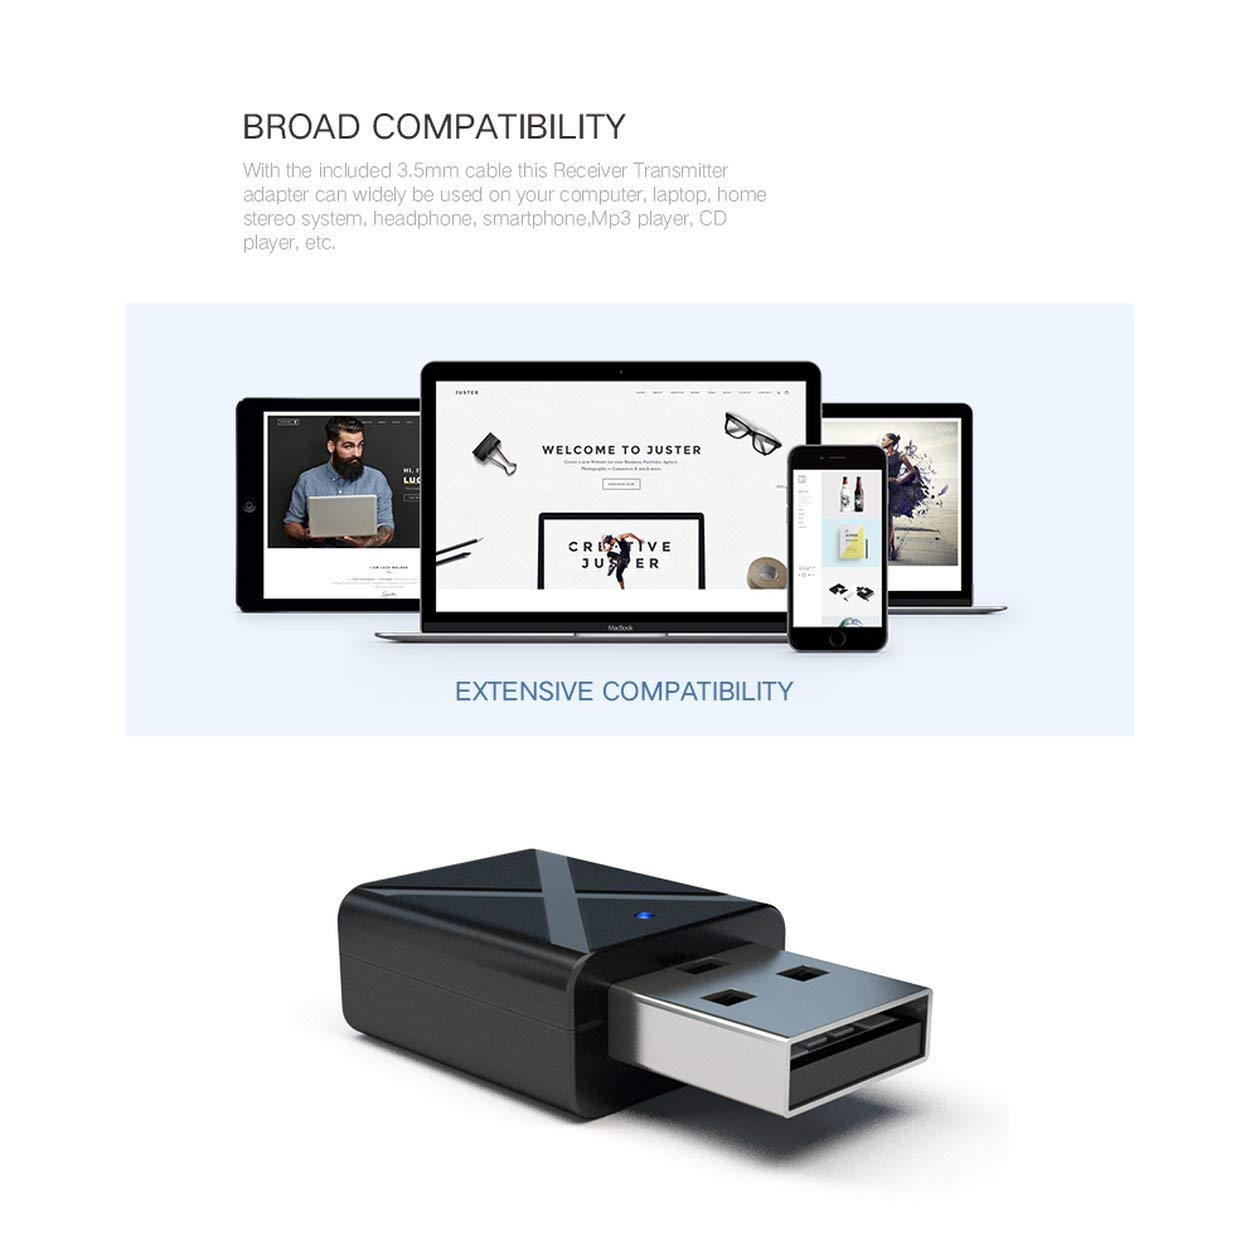 HONZIRY Transmisor USB Transmite Mini V3.0 Transmisor de Audio Adaptador est/éreo para TV iPod Mp3 Mp4 PC